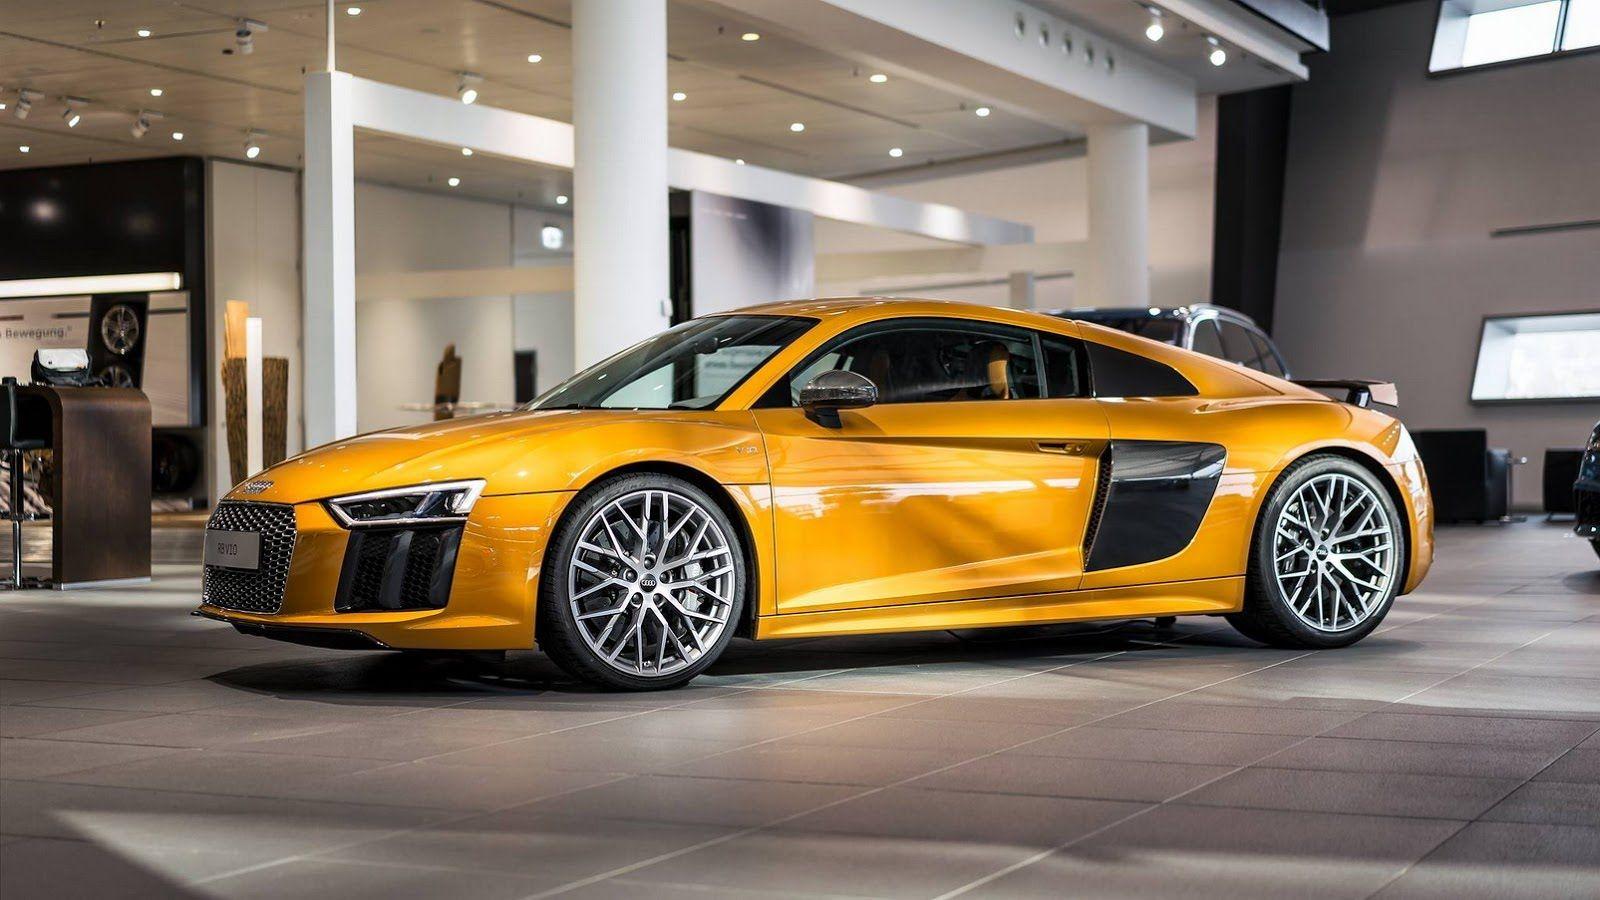 Orange Pearl Effect Audi R8 V10 Plus HD Wallpapers - http://hdwallpaperswide.co/orange-pearl-effect-audi-r8-v10-plus-hd-wallpapers/